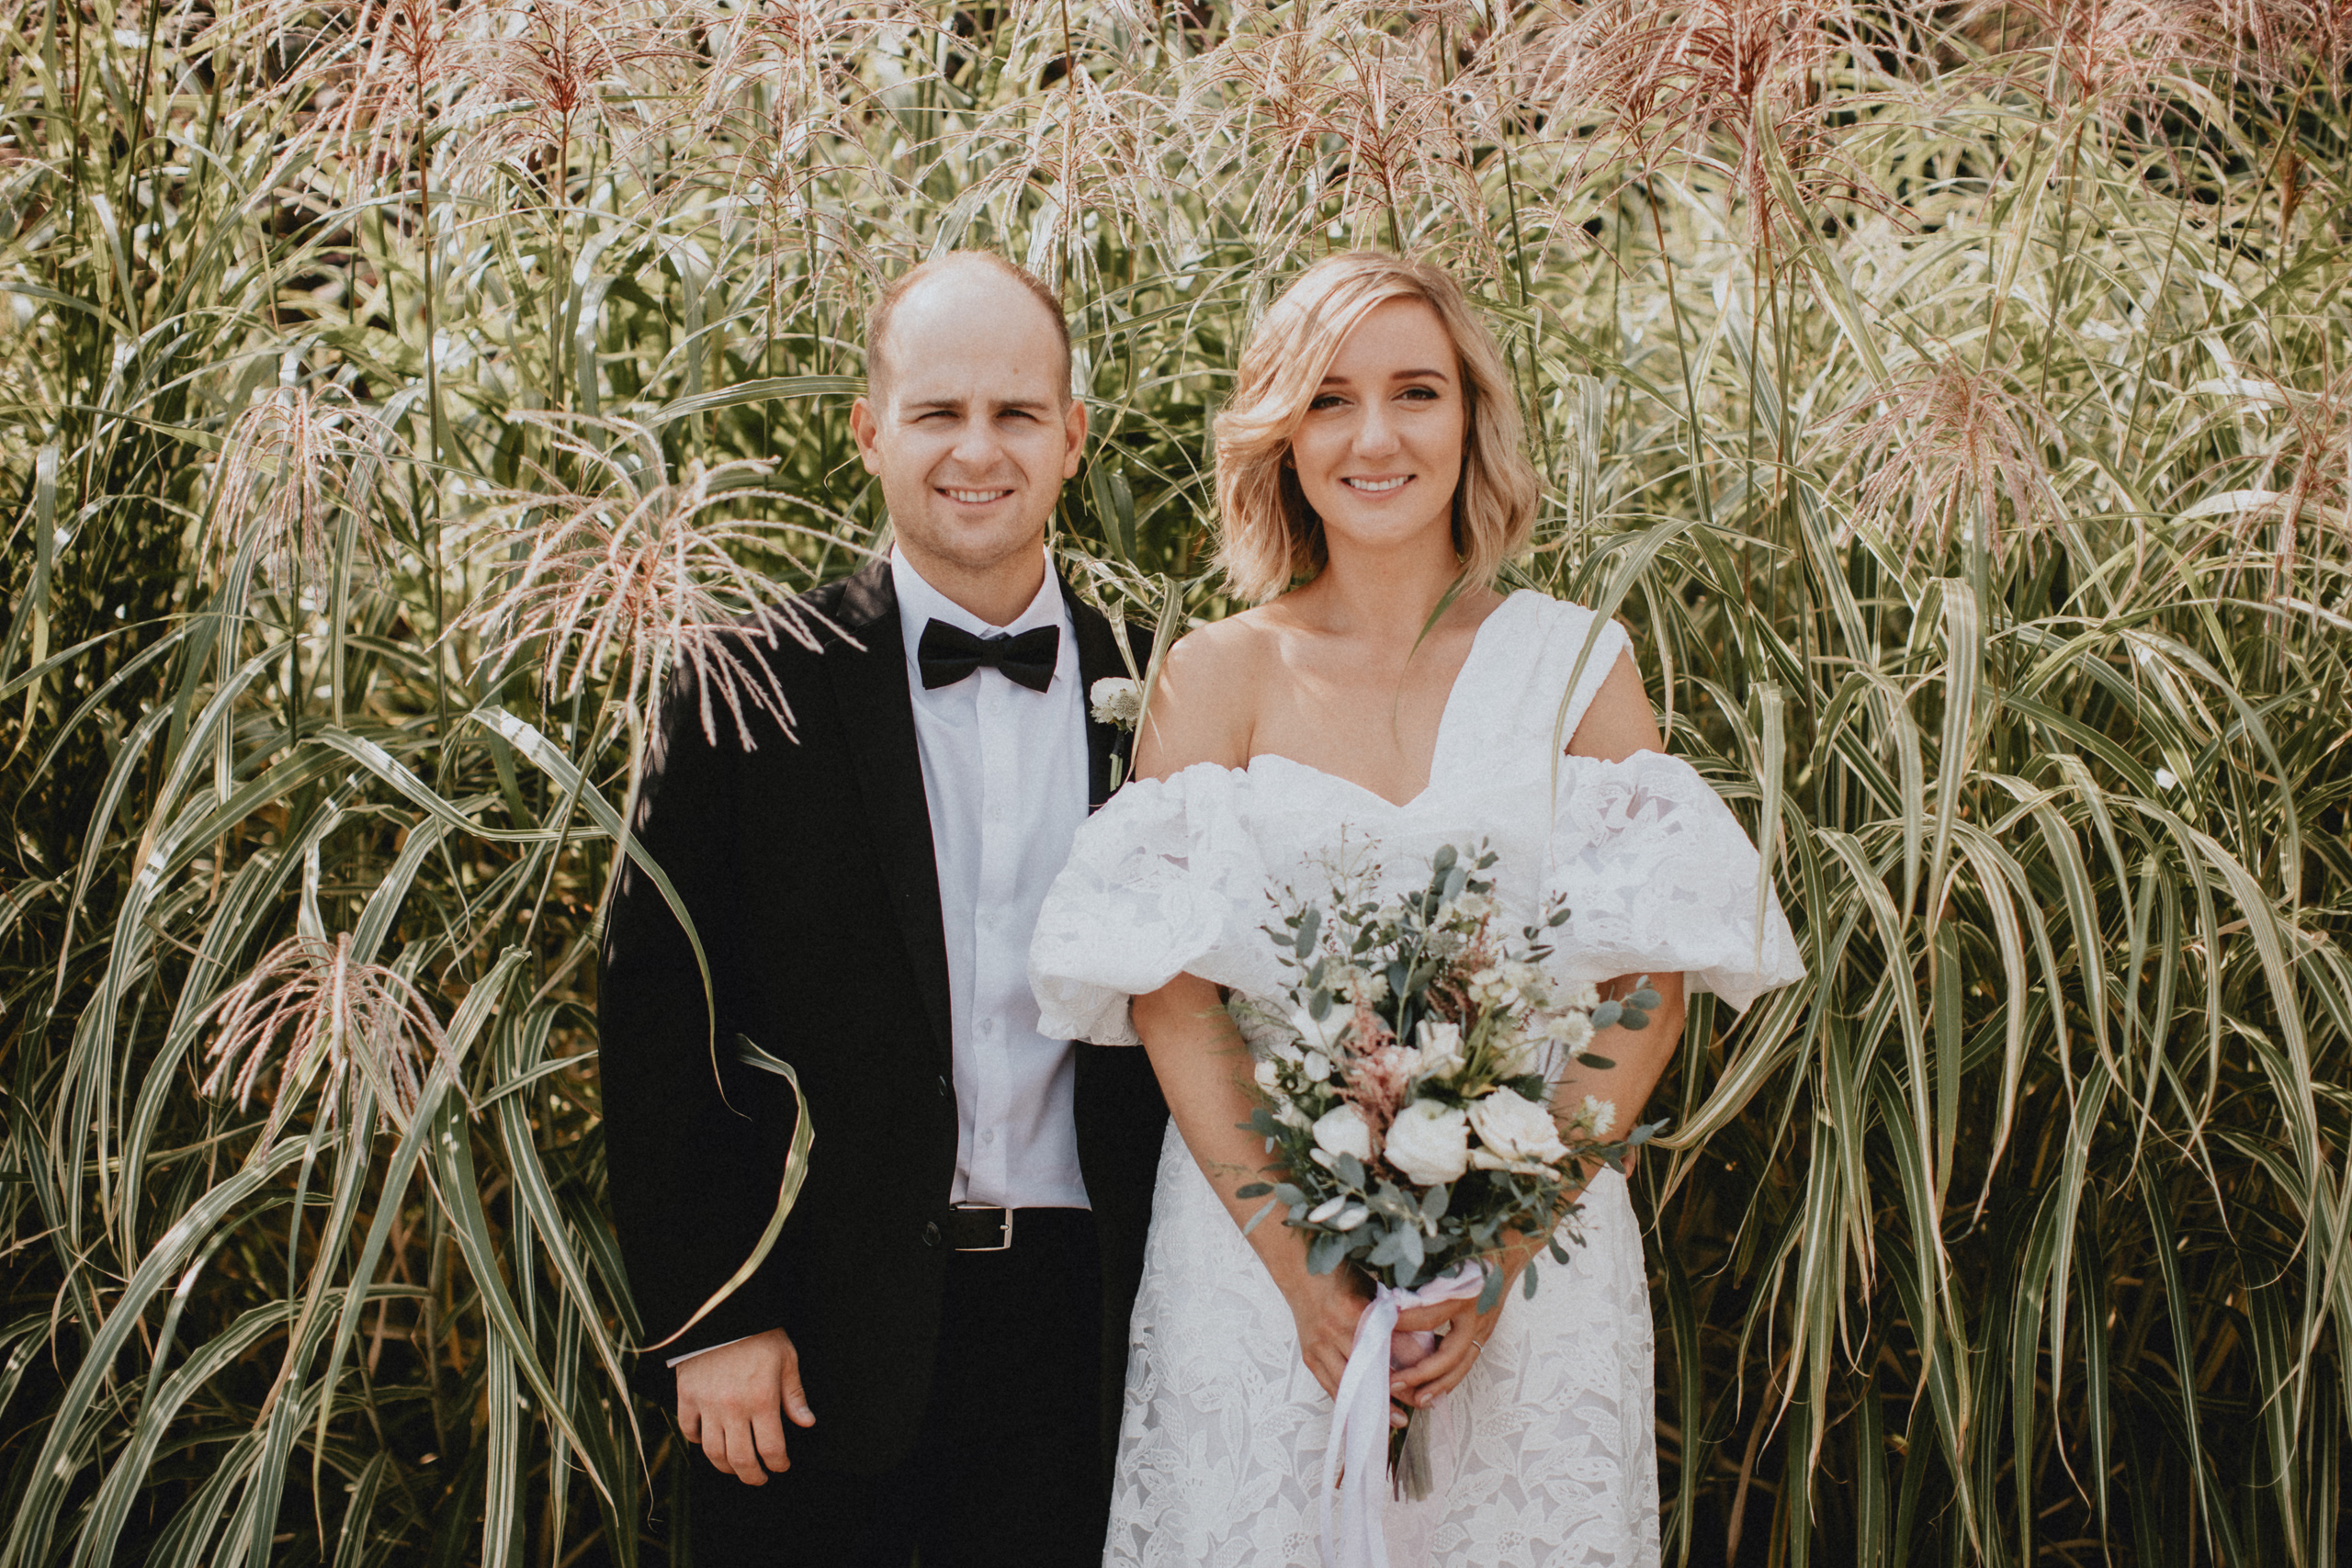 fall wedding tall reeds grasses niagara photographer